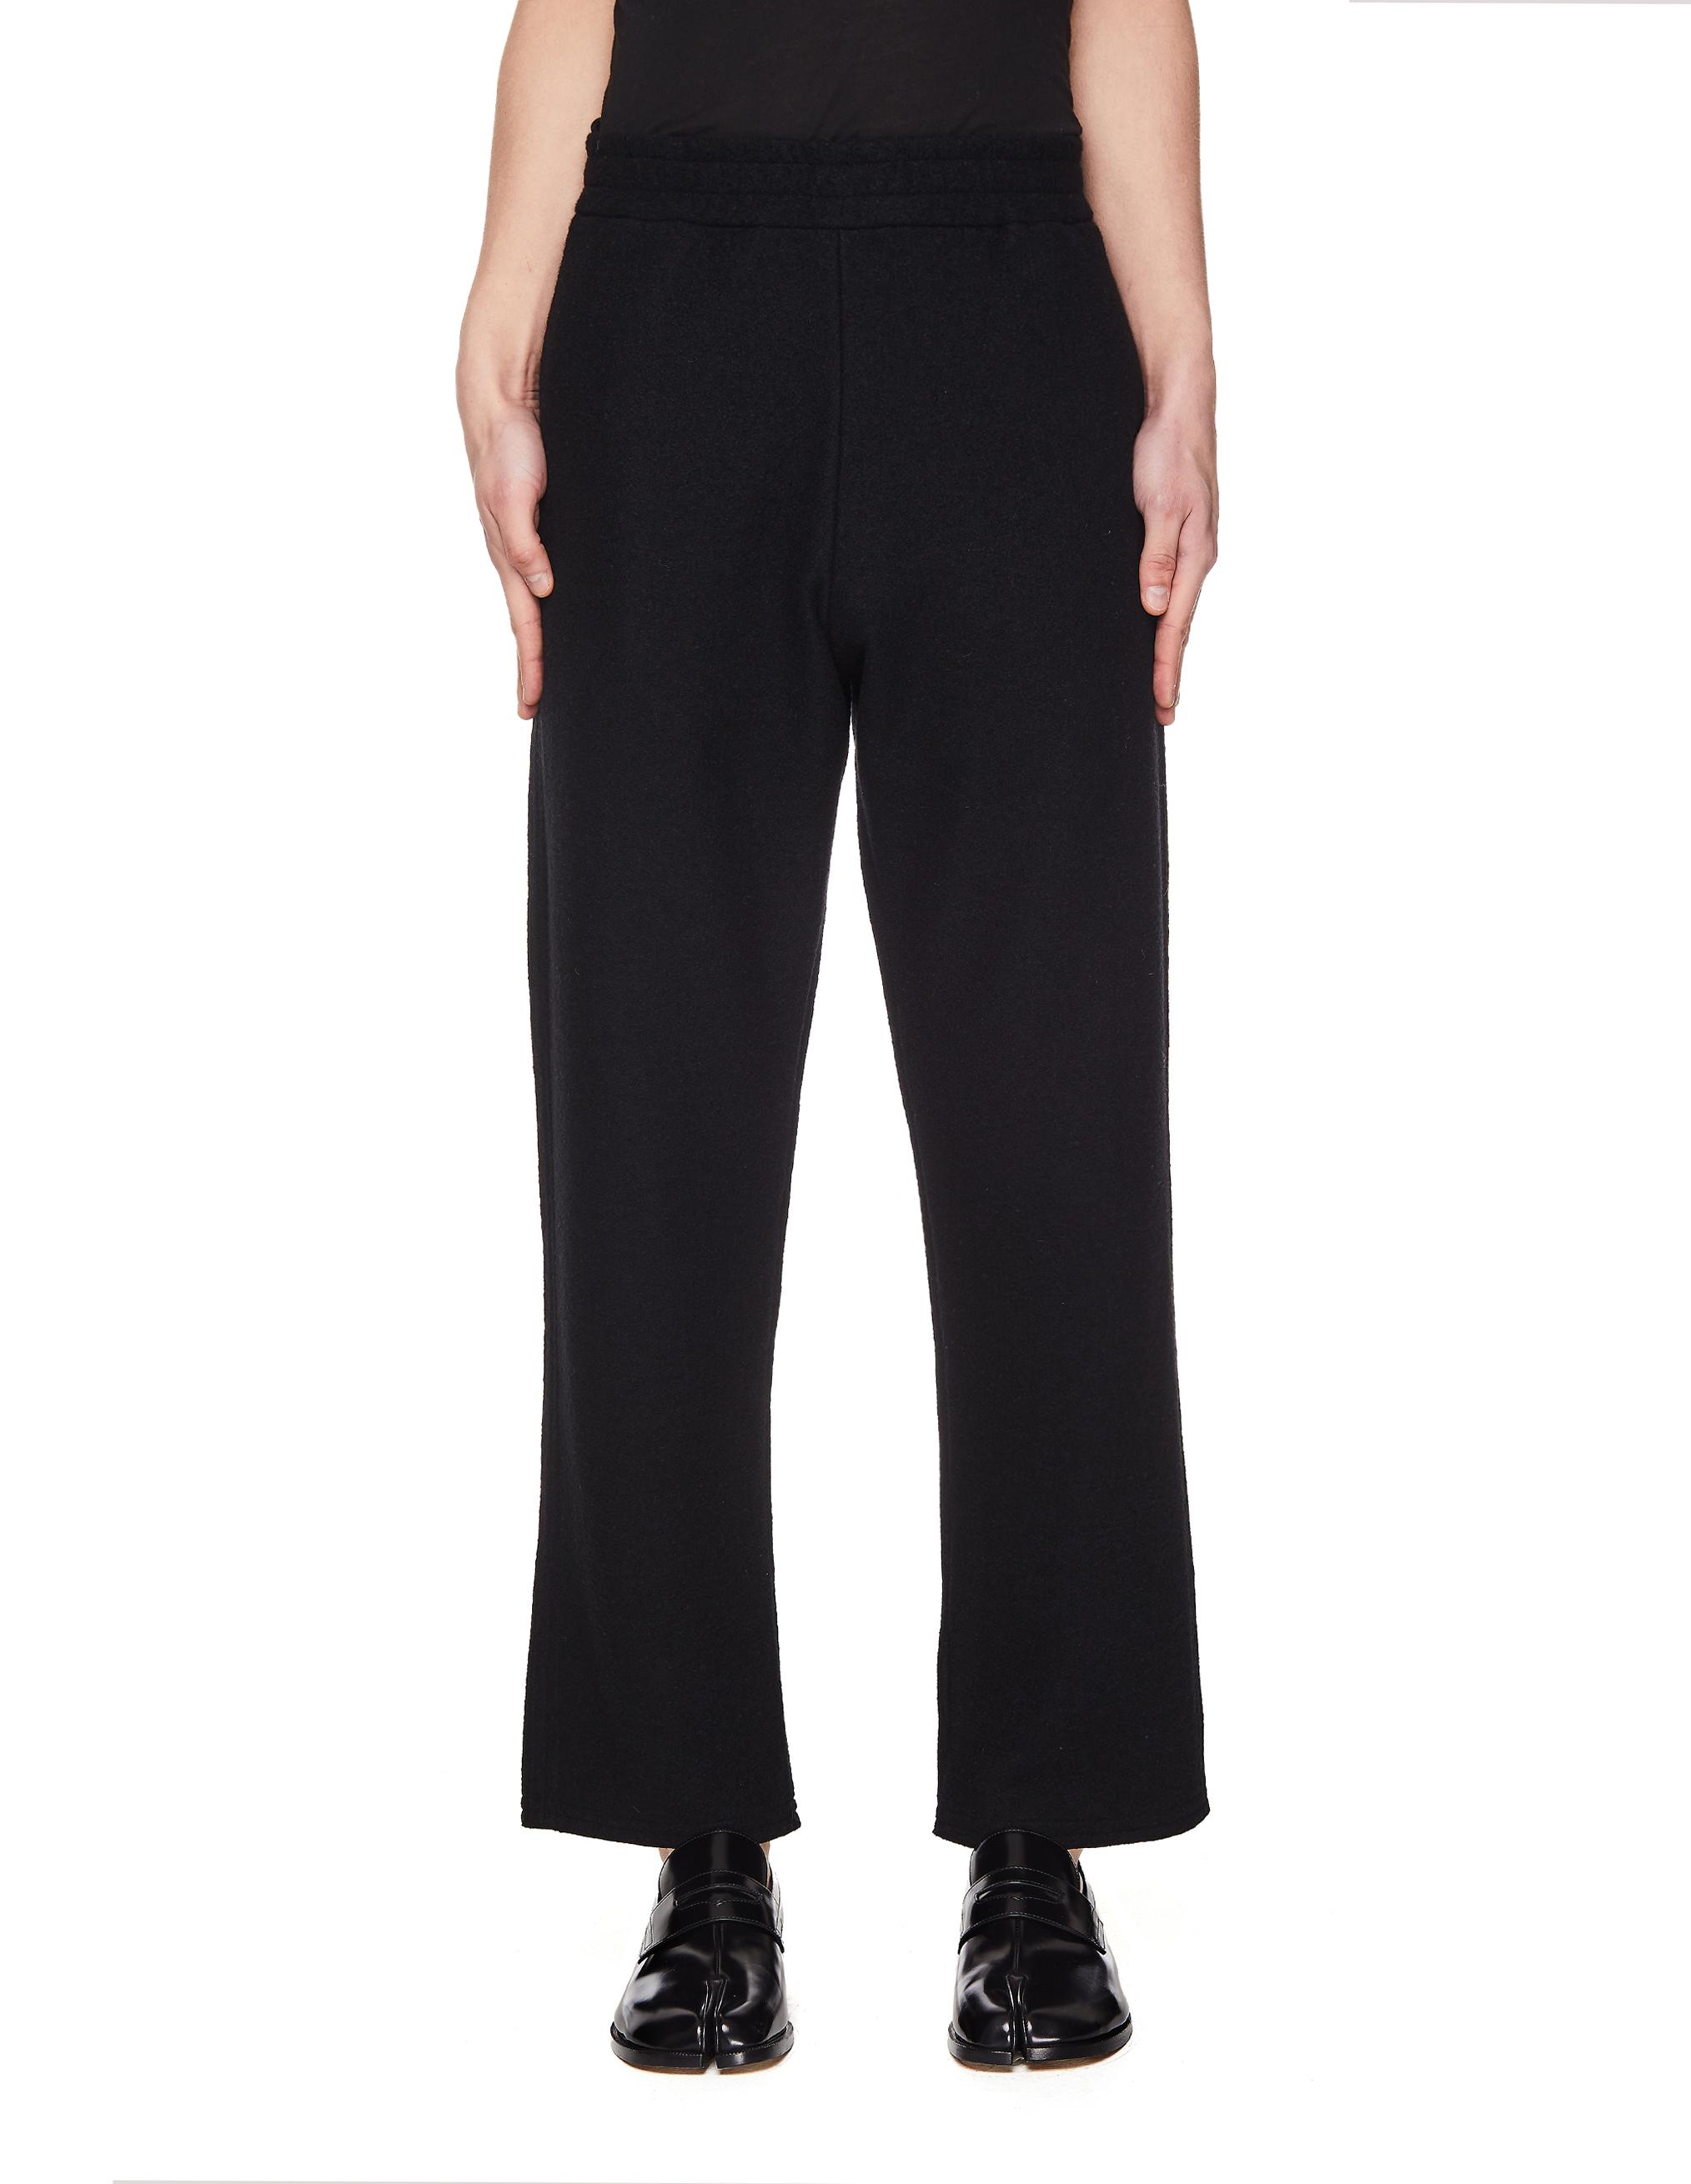 Jil Sander Black Wool Blend Trousers